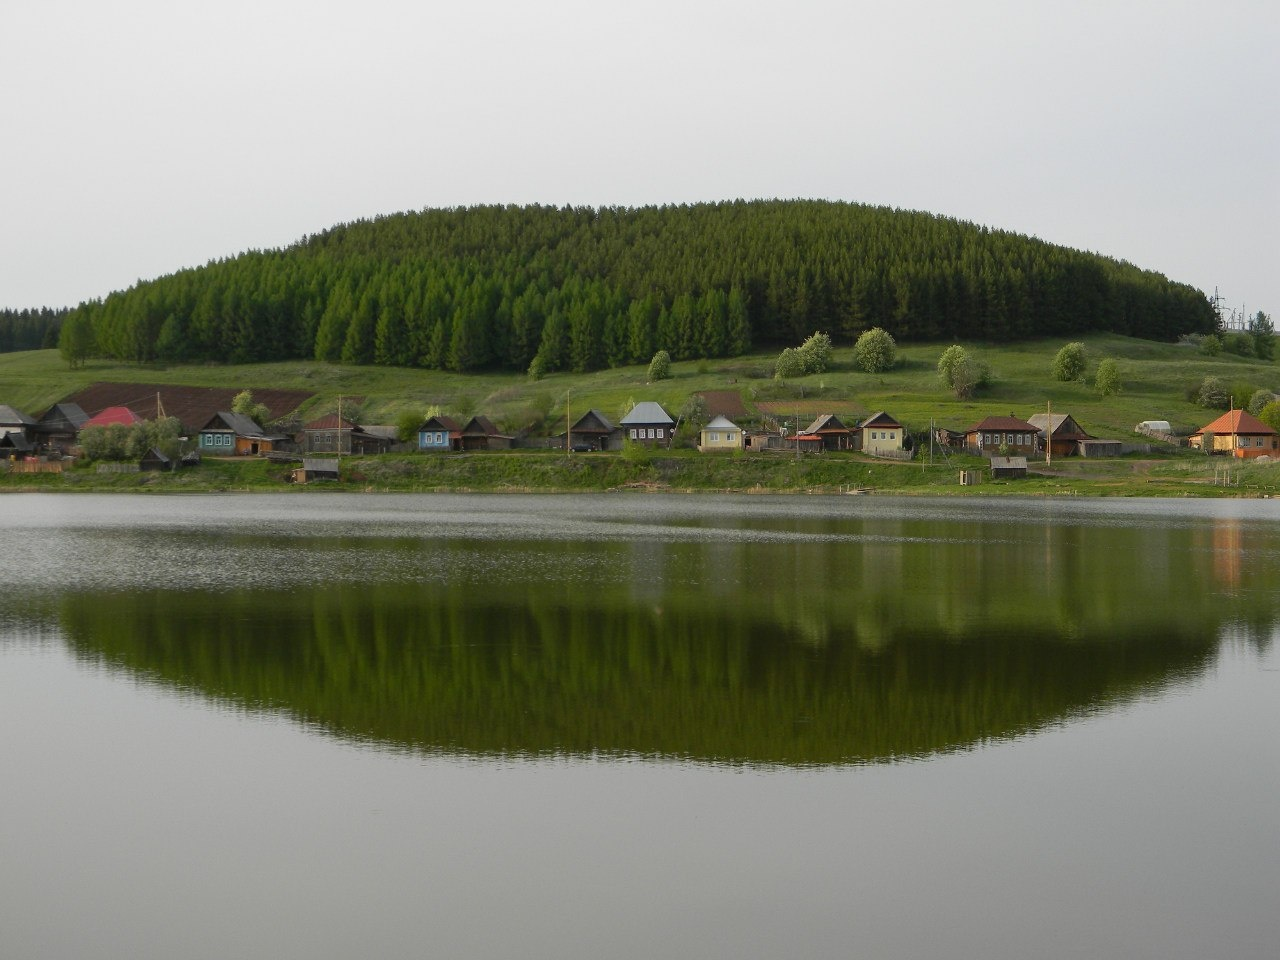 Центр отдыха «Калинино» Пермский край, фото 8